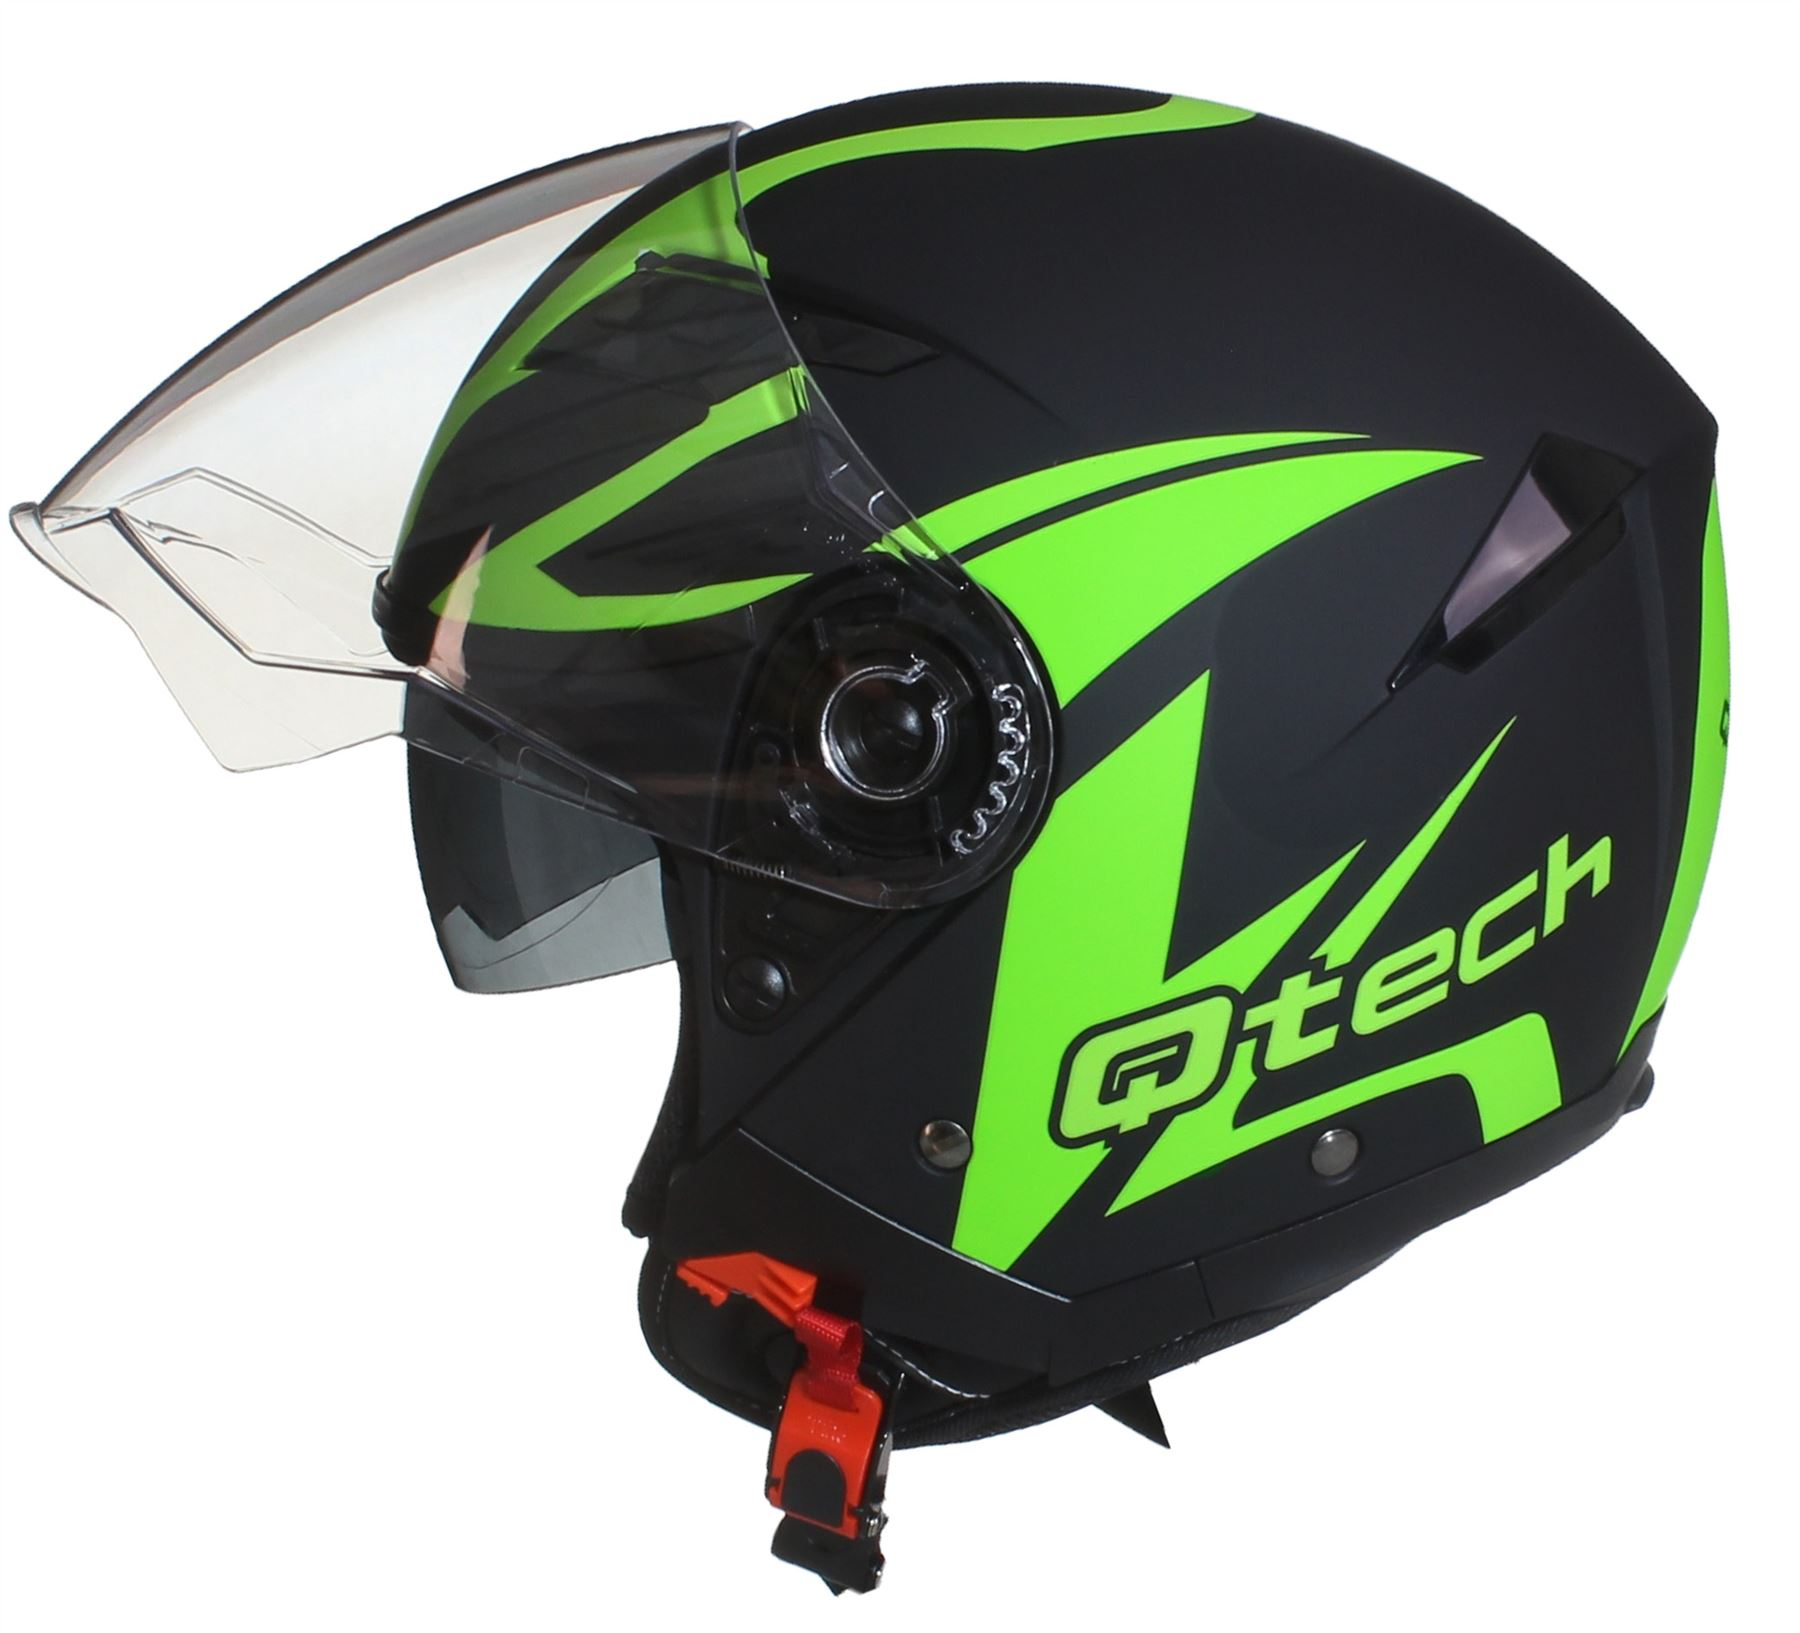 casque de moto face ouverte pare soleil interne jet helm double visi re scooter ebay. Black Bedroom Furniture Sets. Home Design Ideas